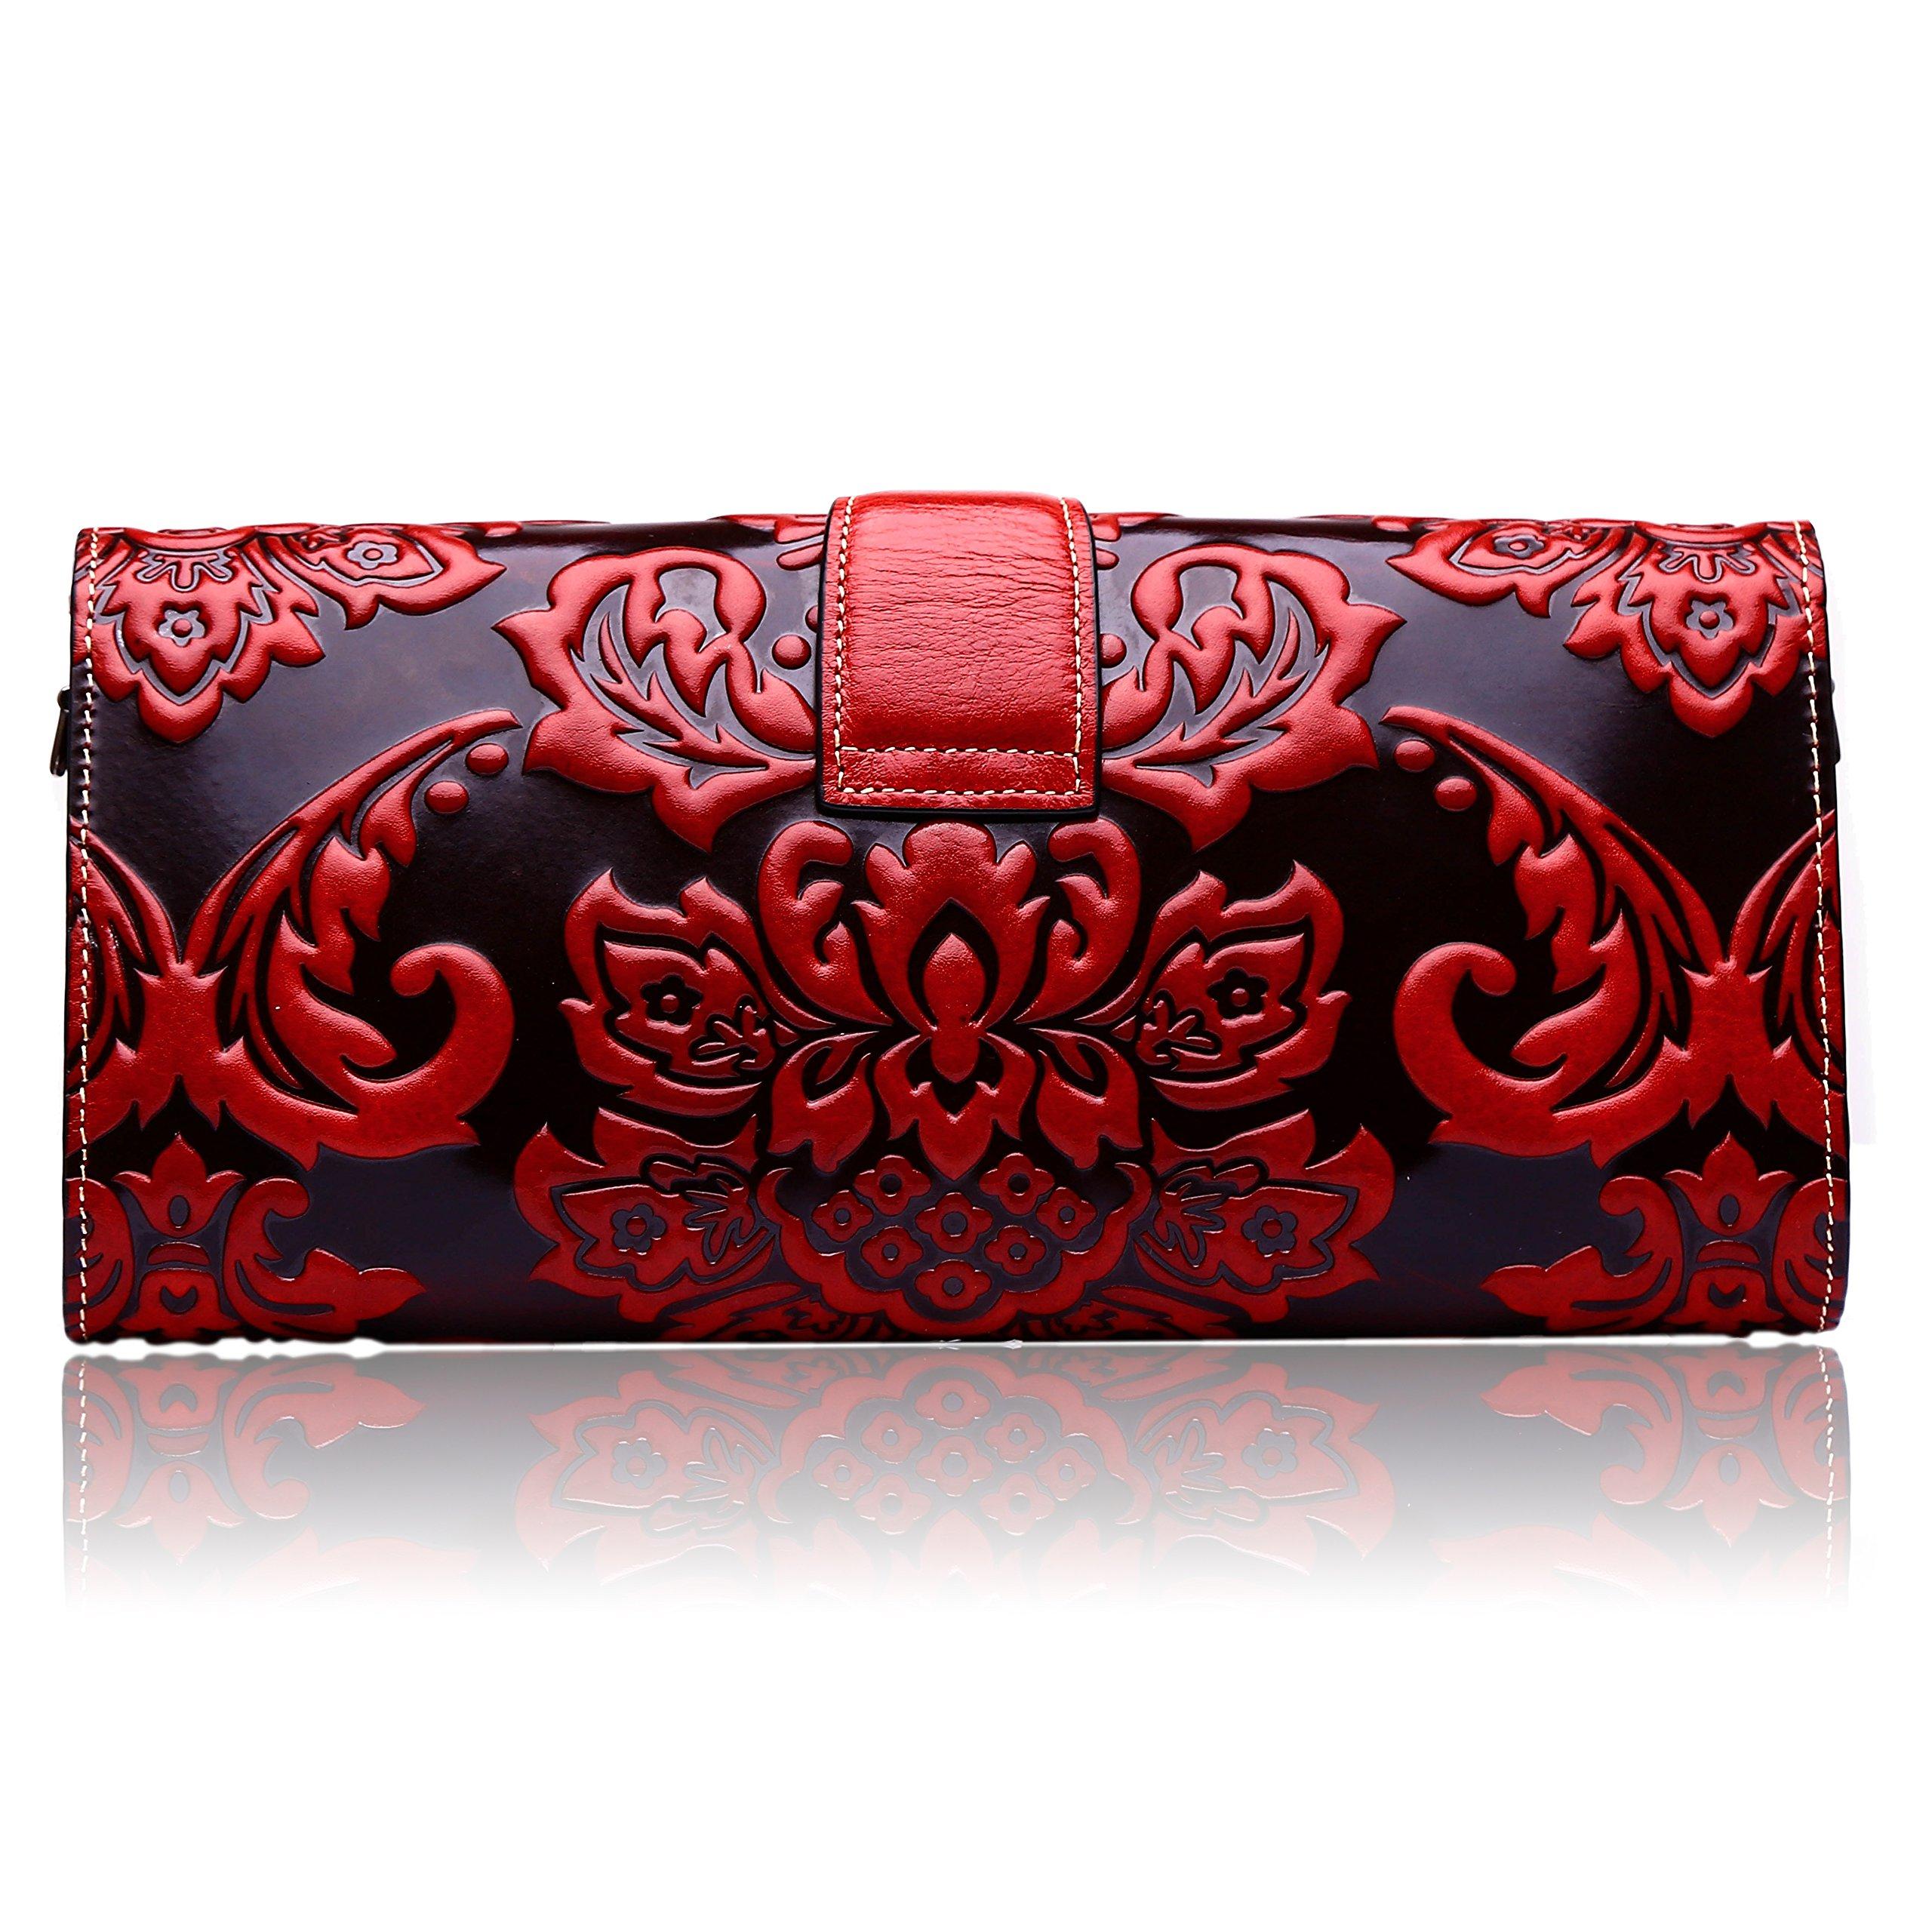 Naisibao Vintage Floral Artisan Leather Handmade Clutch Convertible Crossbody Designer Gift for Women by Naisibao (Image #3)